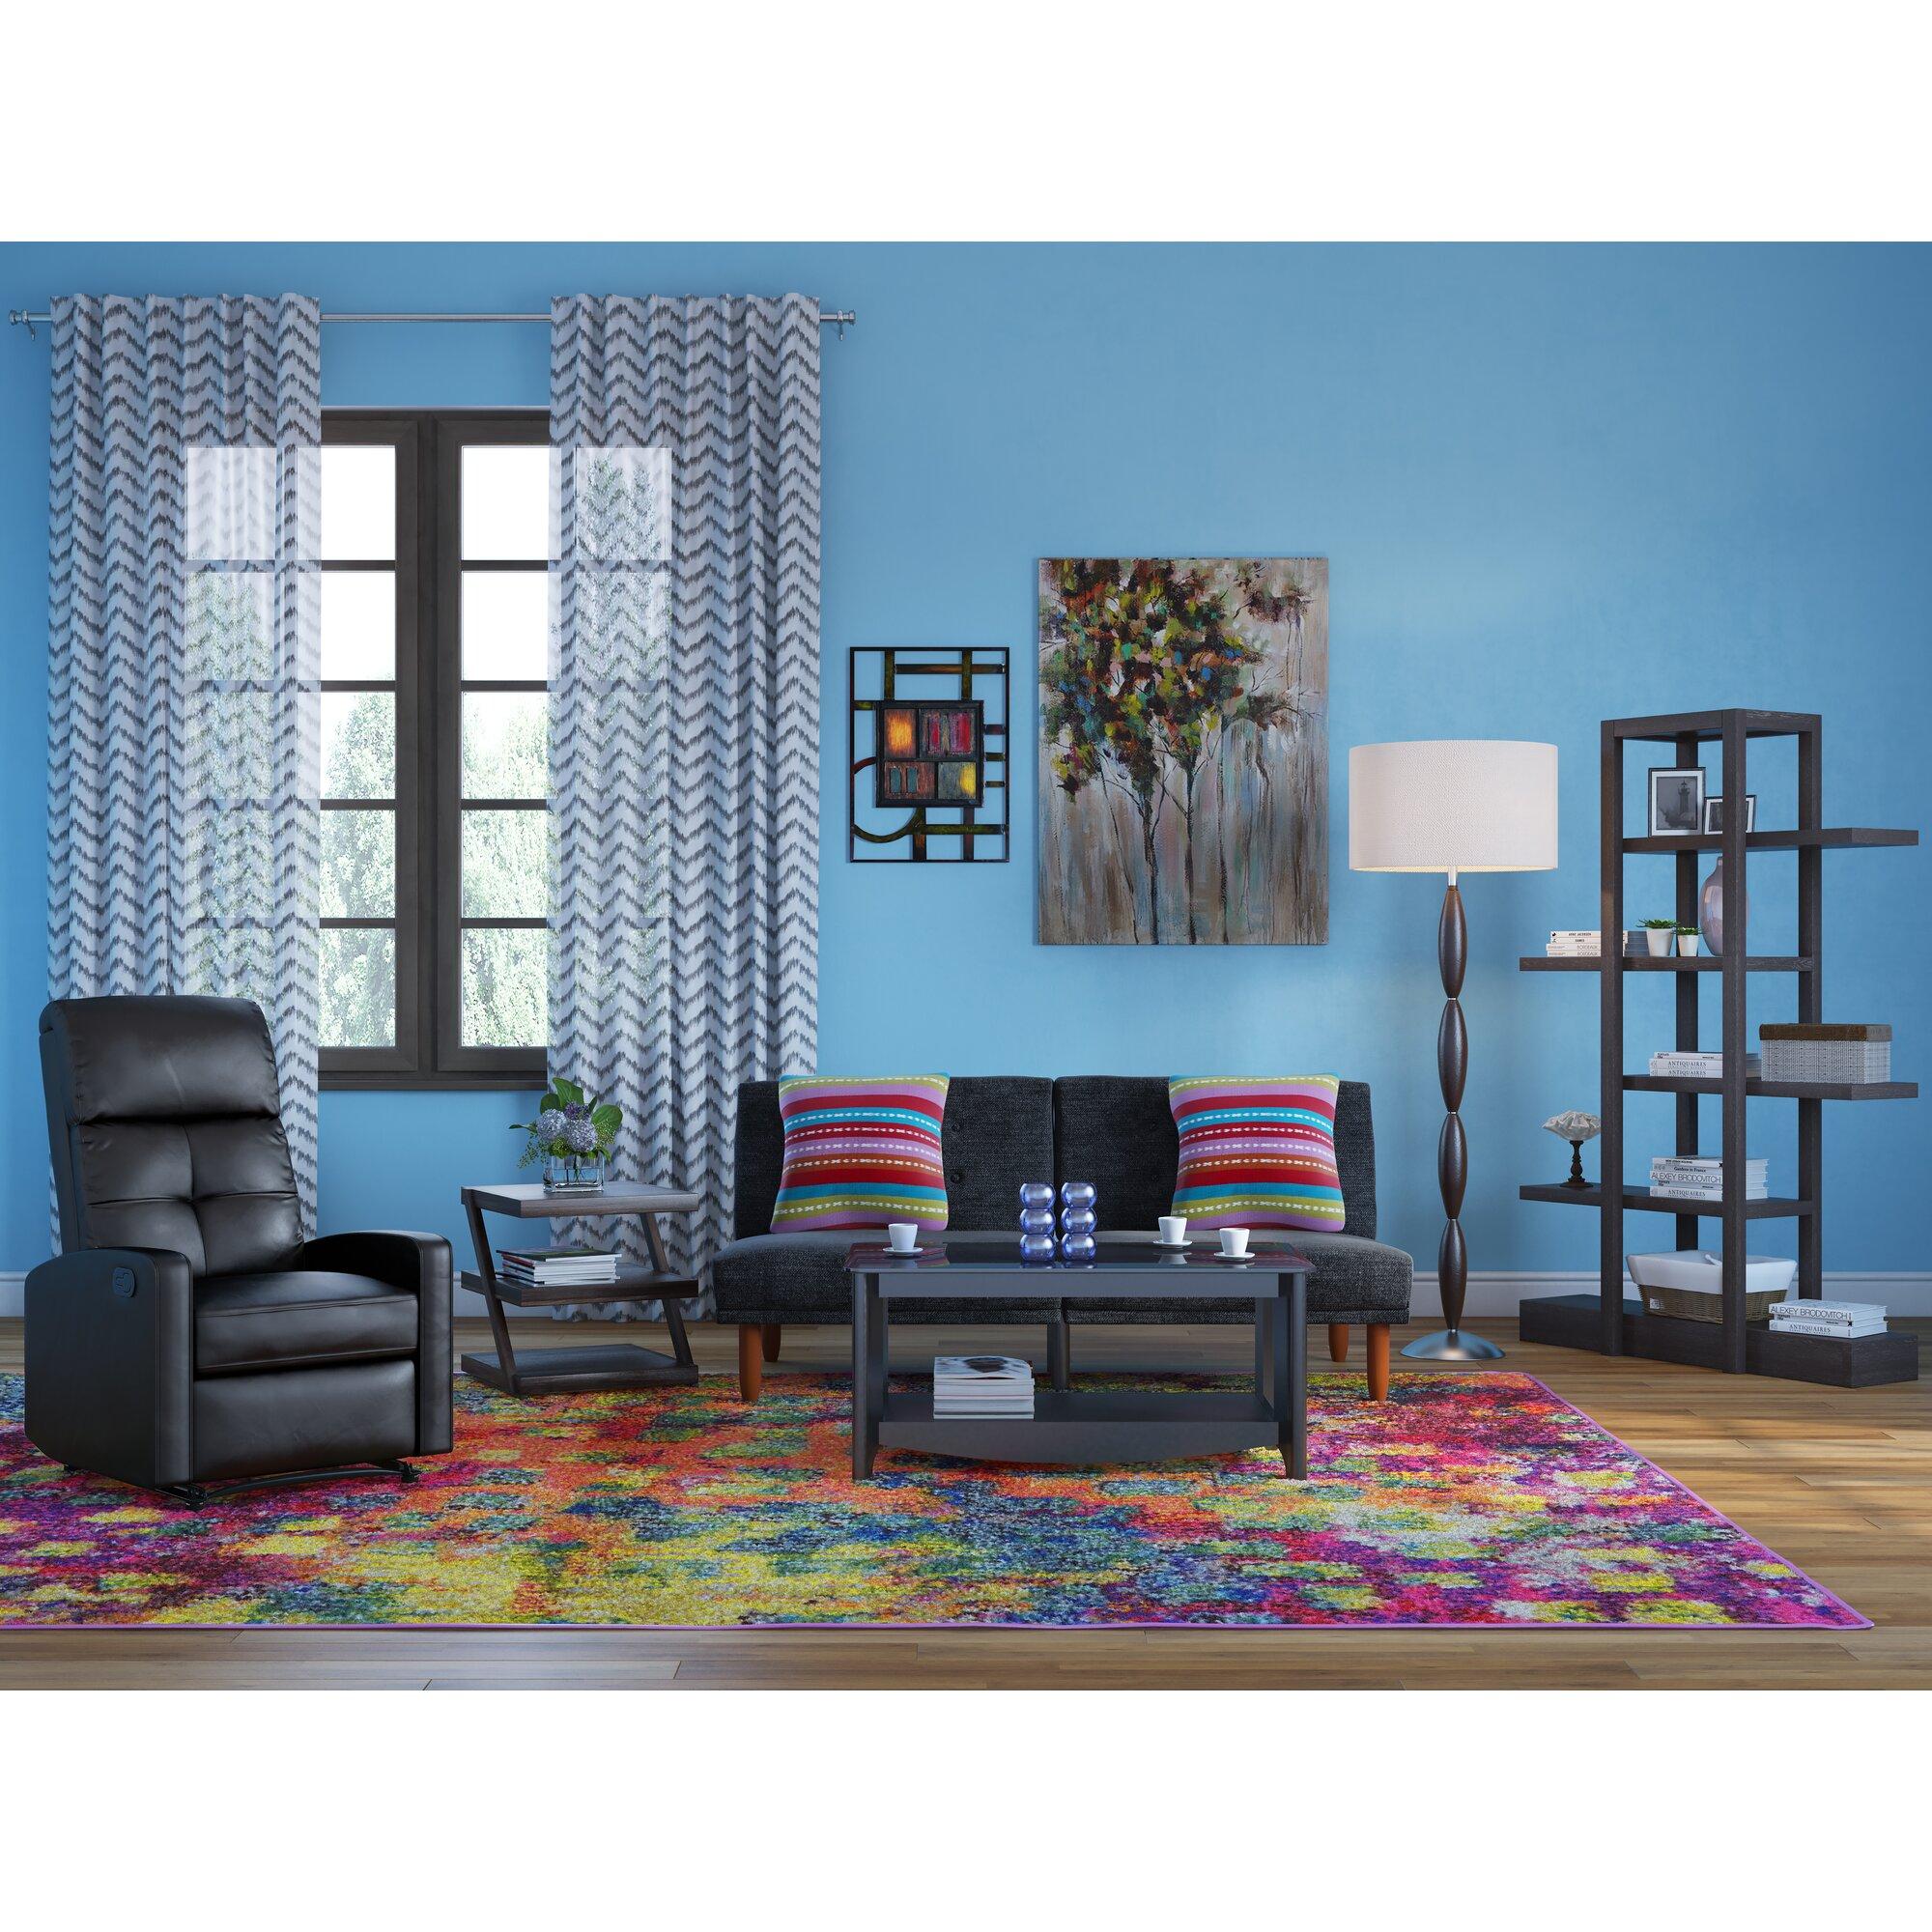 carthage 71 etagere bookcase reviews allmodern. Black Bedroom Furniture Sets. Home Design Ideas